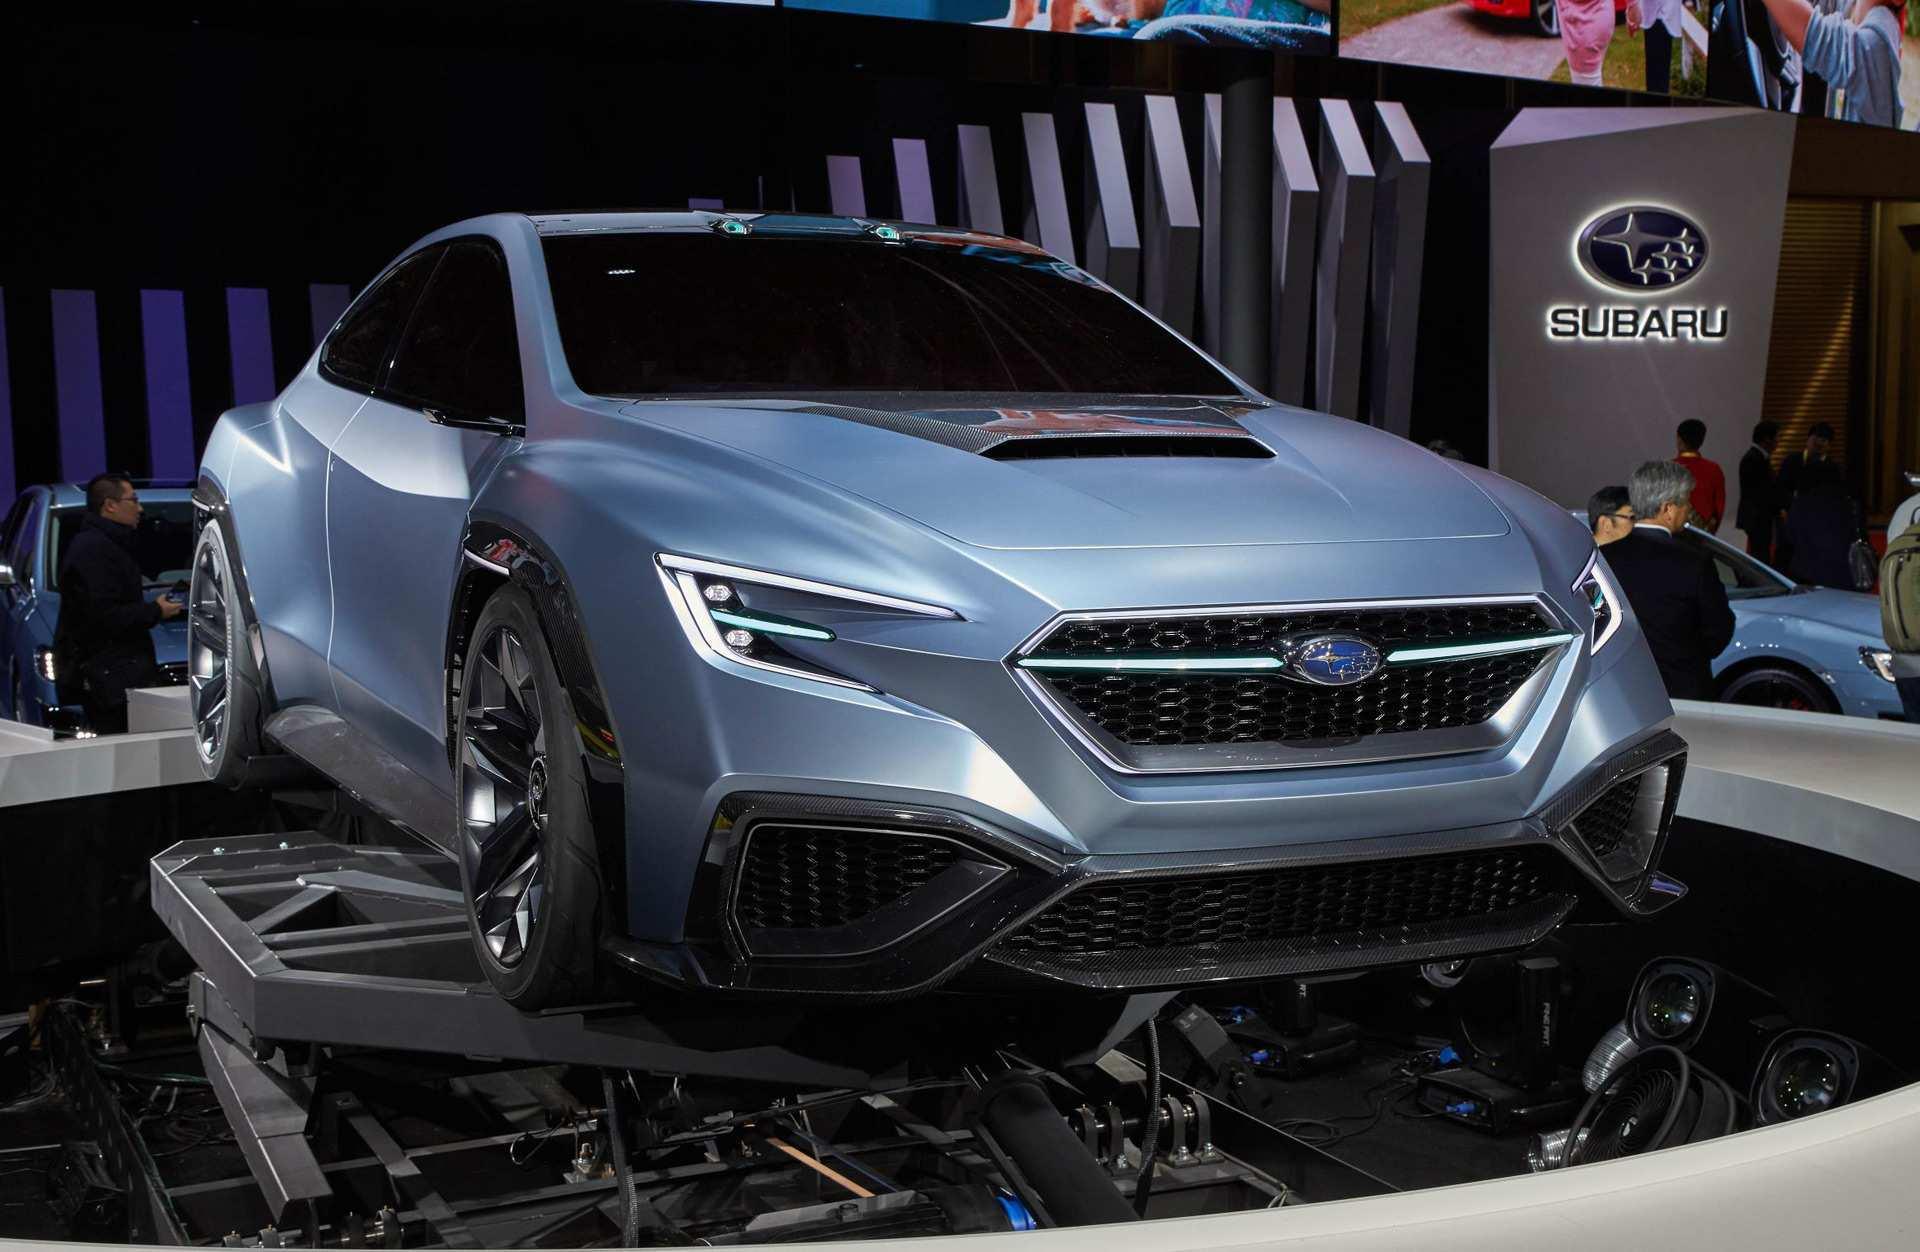 98 Gallery of 2020 Subaru Models Images with 2020 Subaru Models